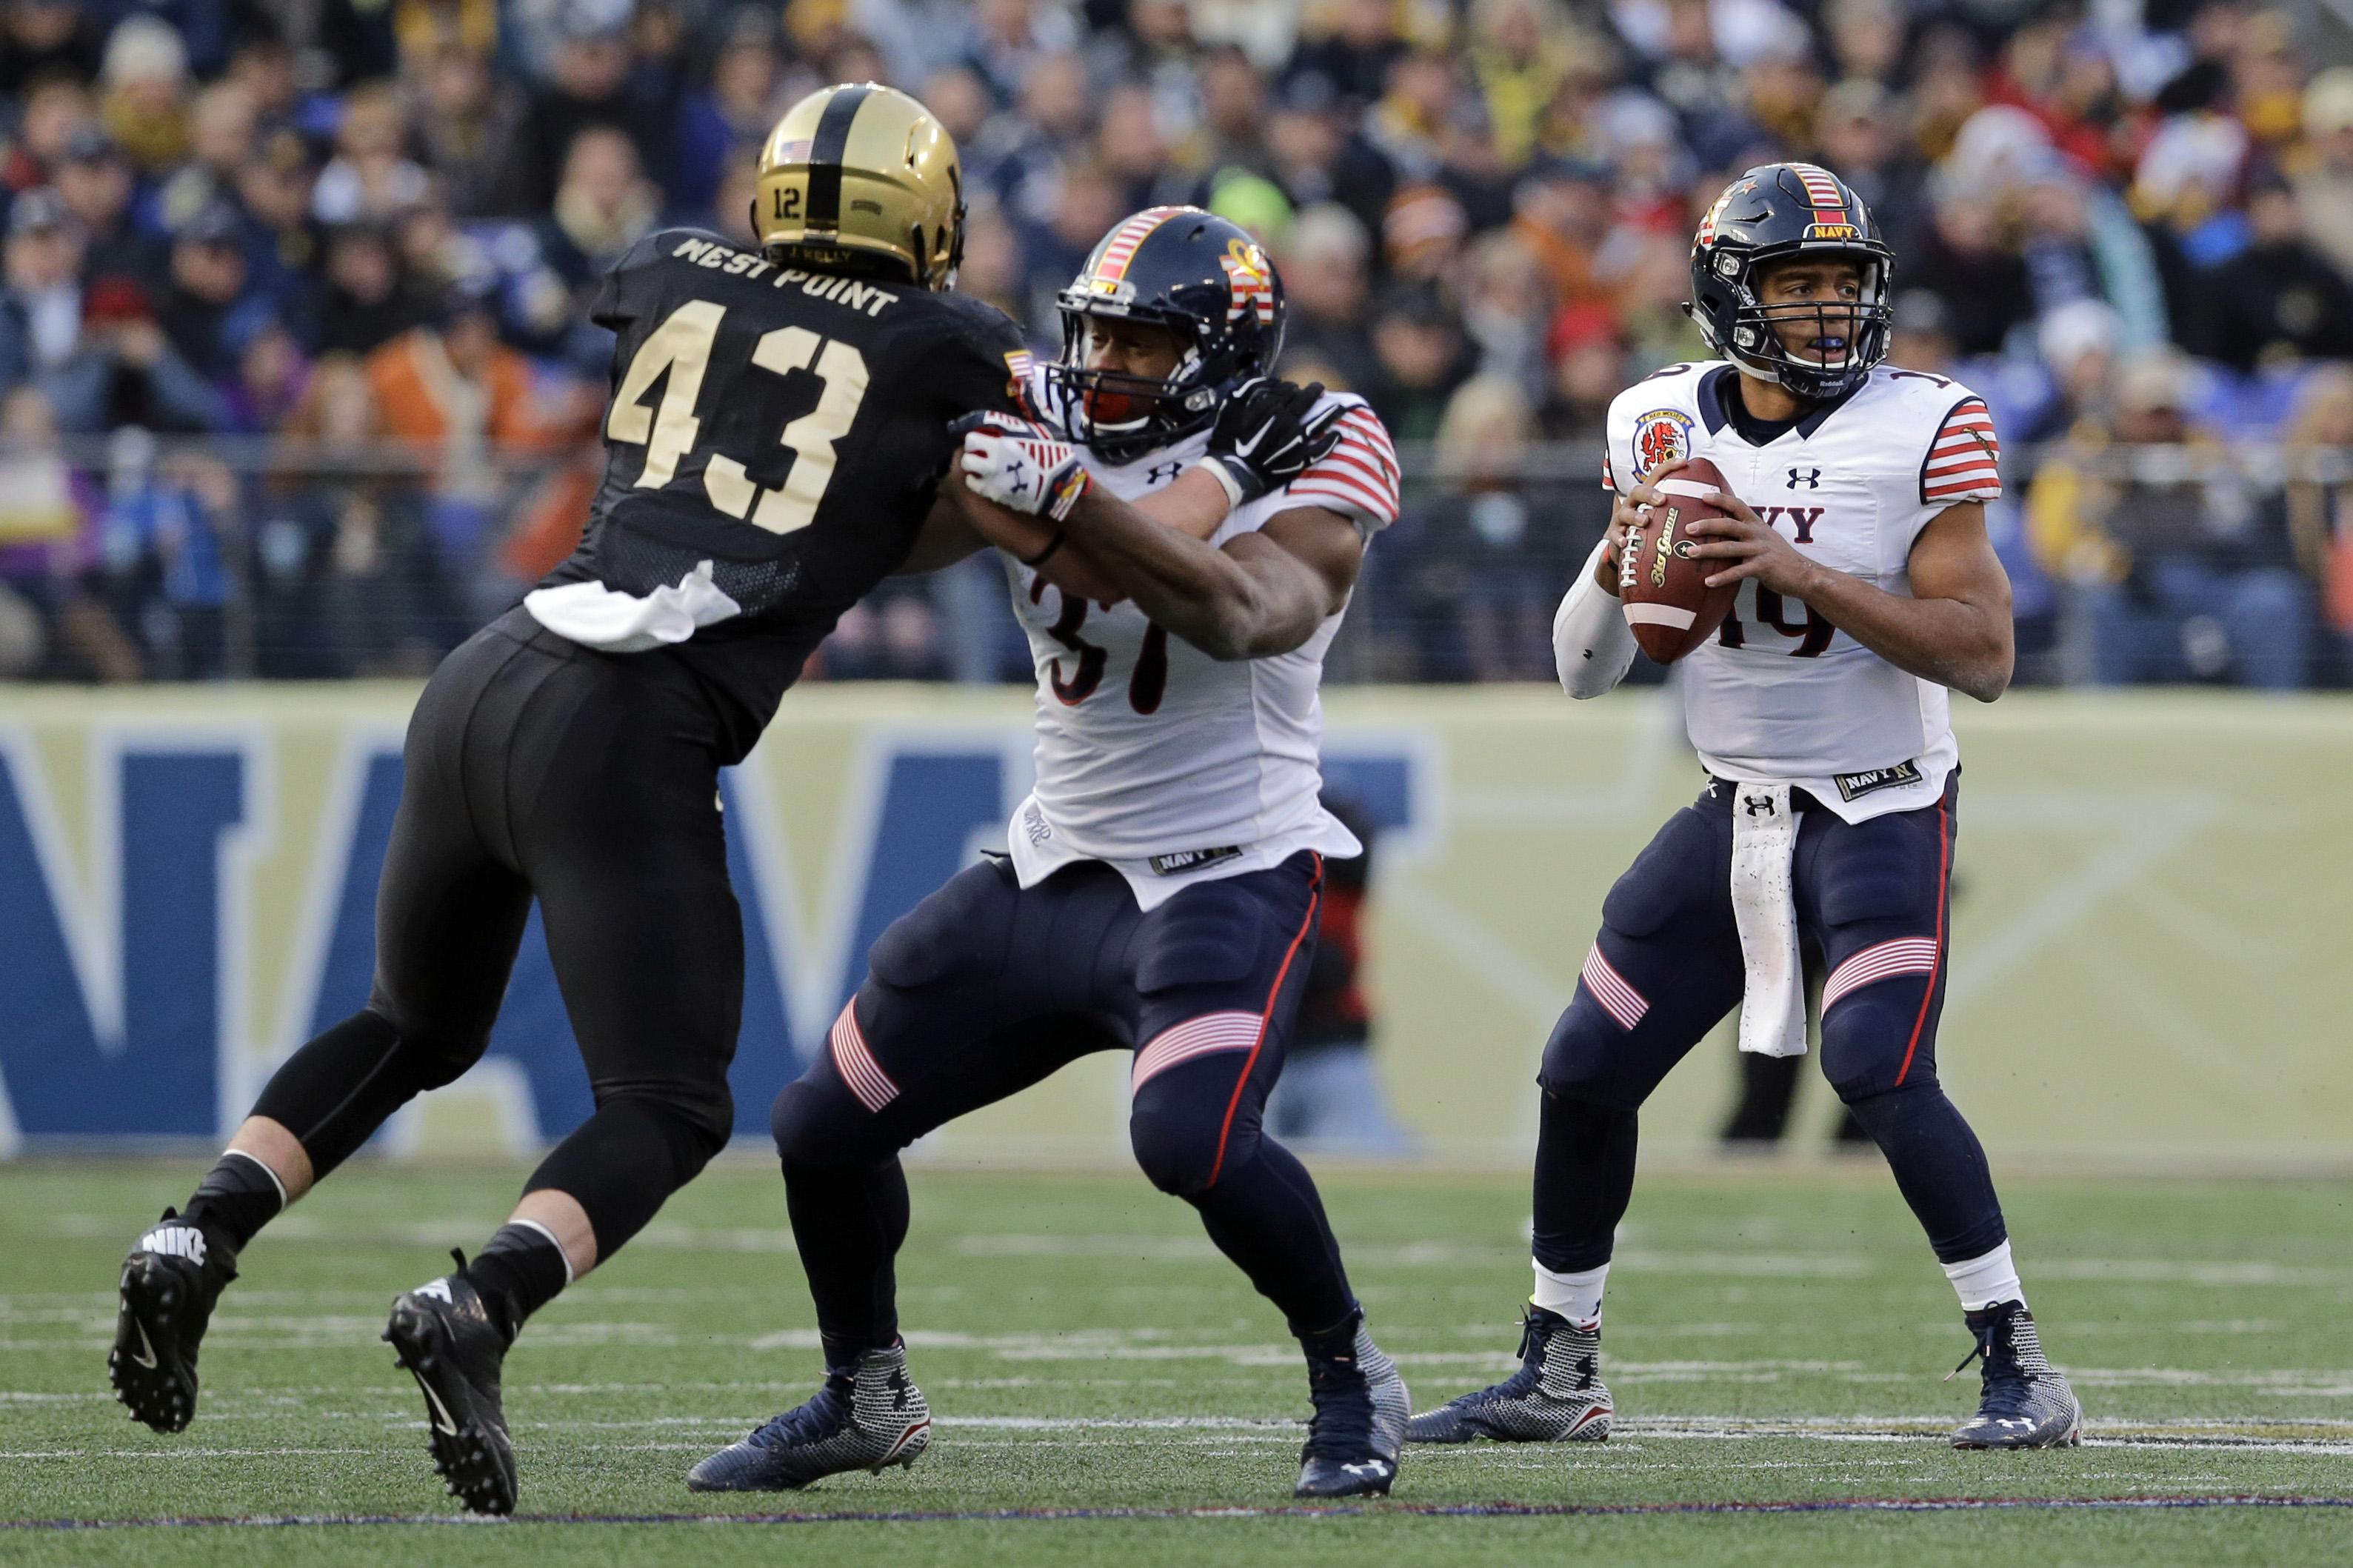 Navy quarterback Keenan Reynolds, right, looks for a receiver as teammate Chris Swain blocks Army linebacker James Kelly. Saturday, Dec. 13, 2014, in Baltimore. (AP Photo/Patrick Semansky)